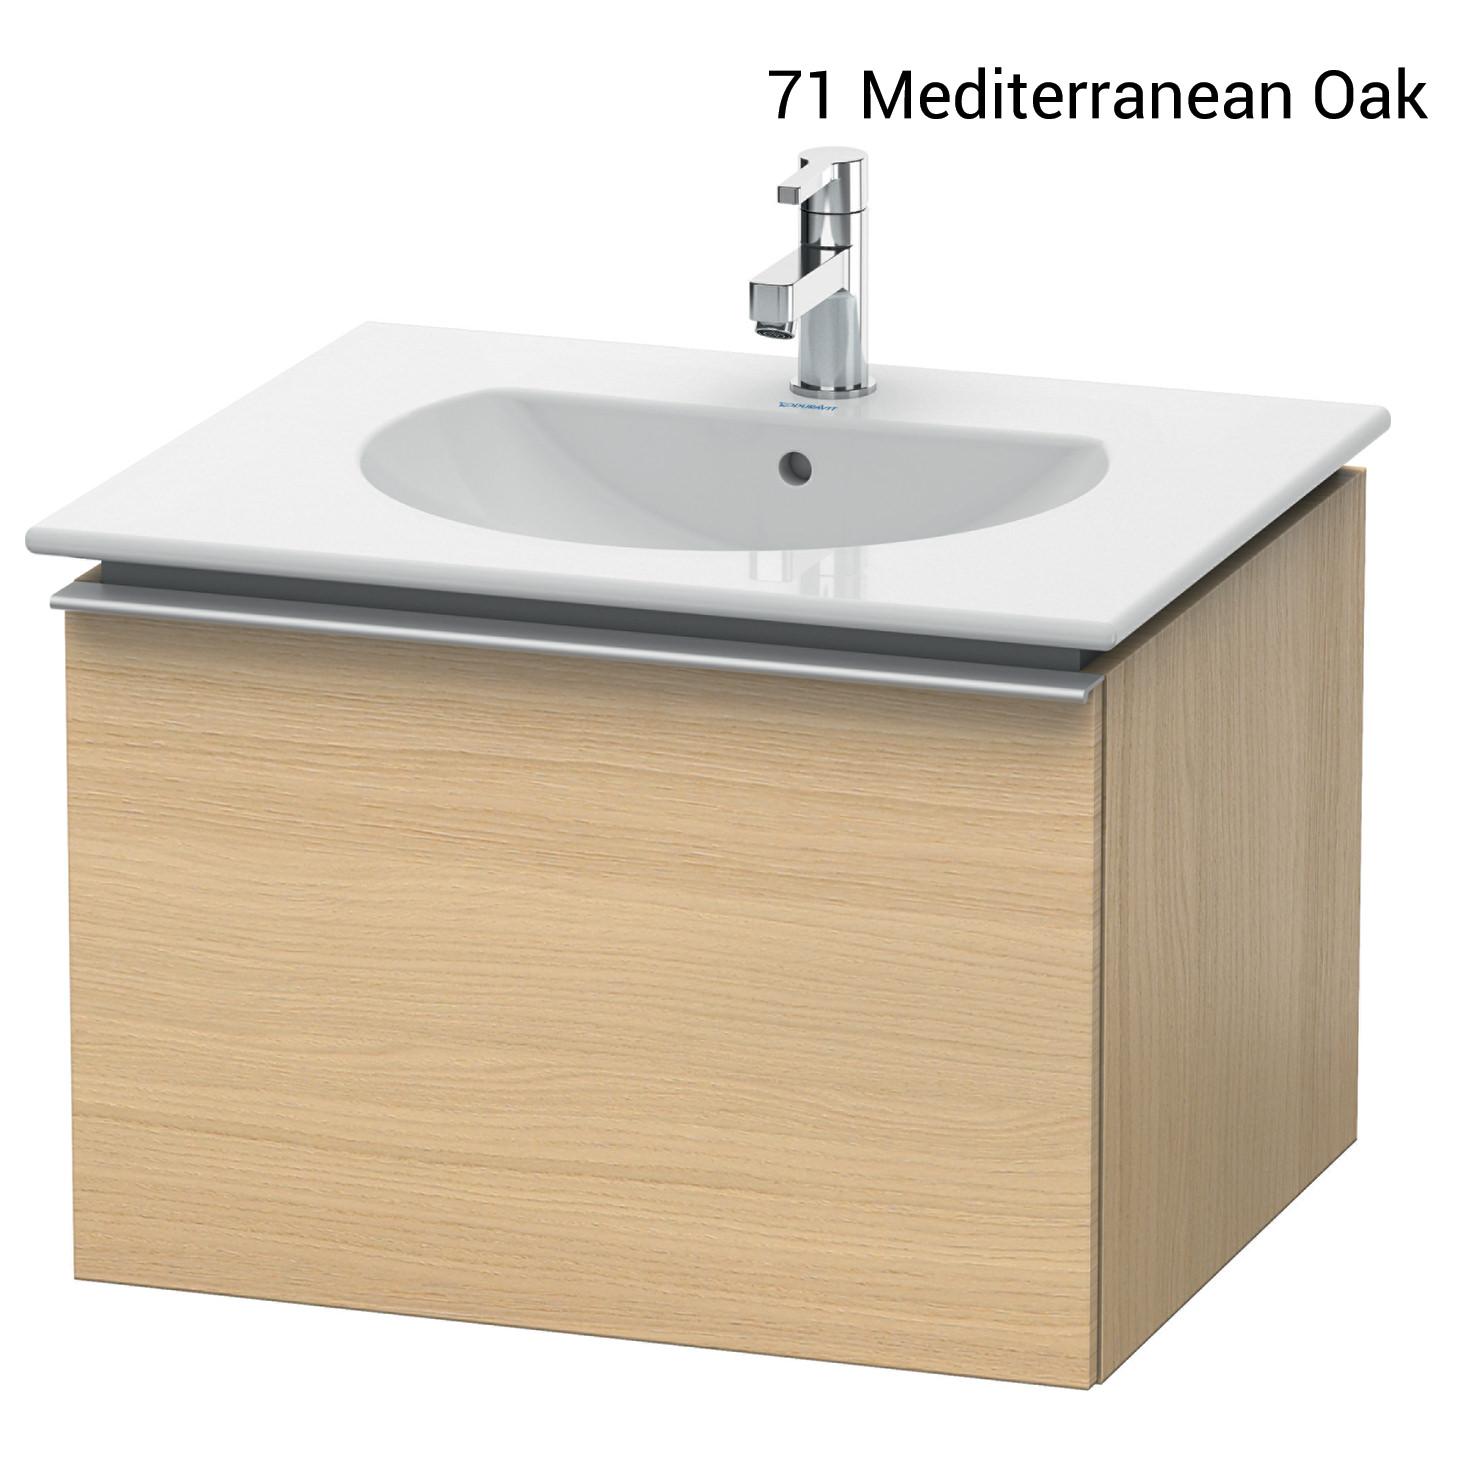 duravit darling new 545 x 600mm white matt vanity unit with basin. Black Bedroom Furniture Sets. Home Design Ideas